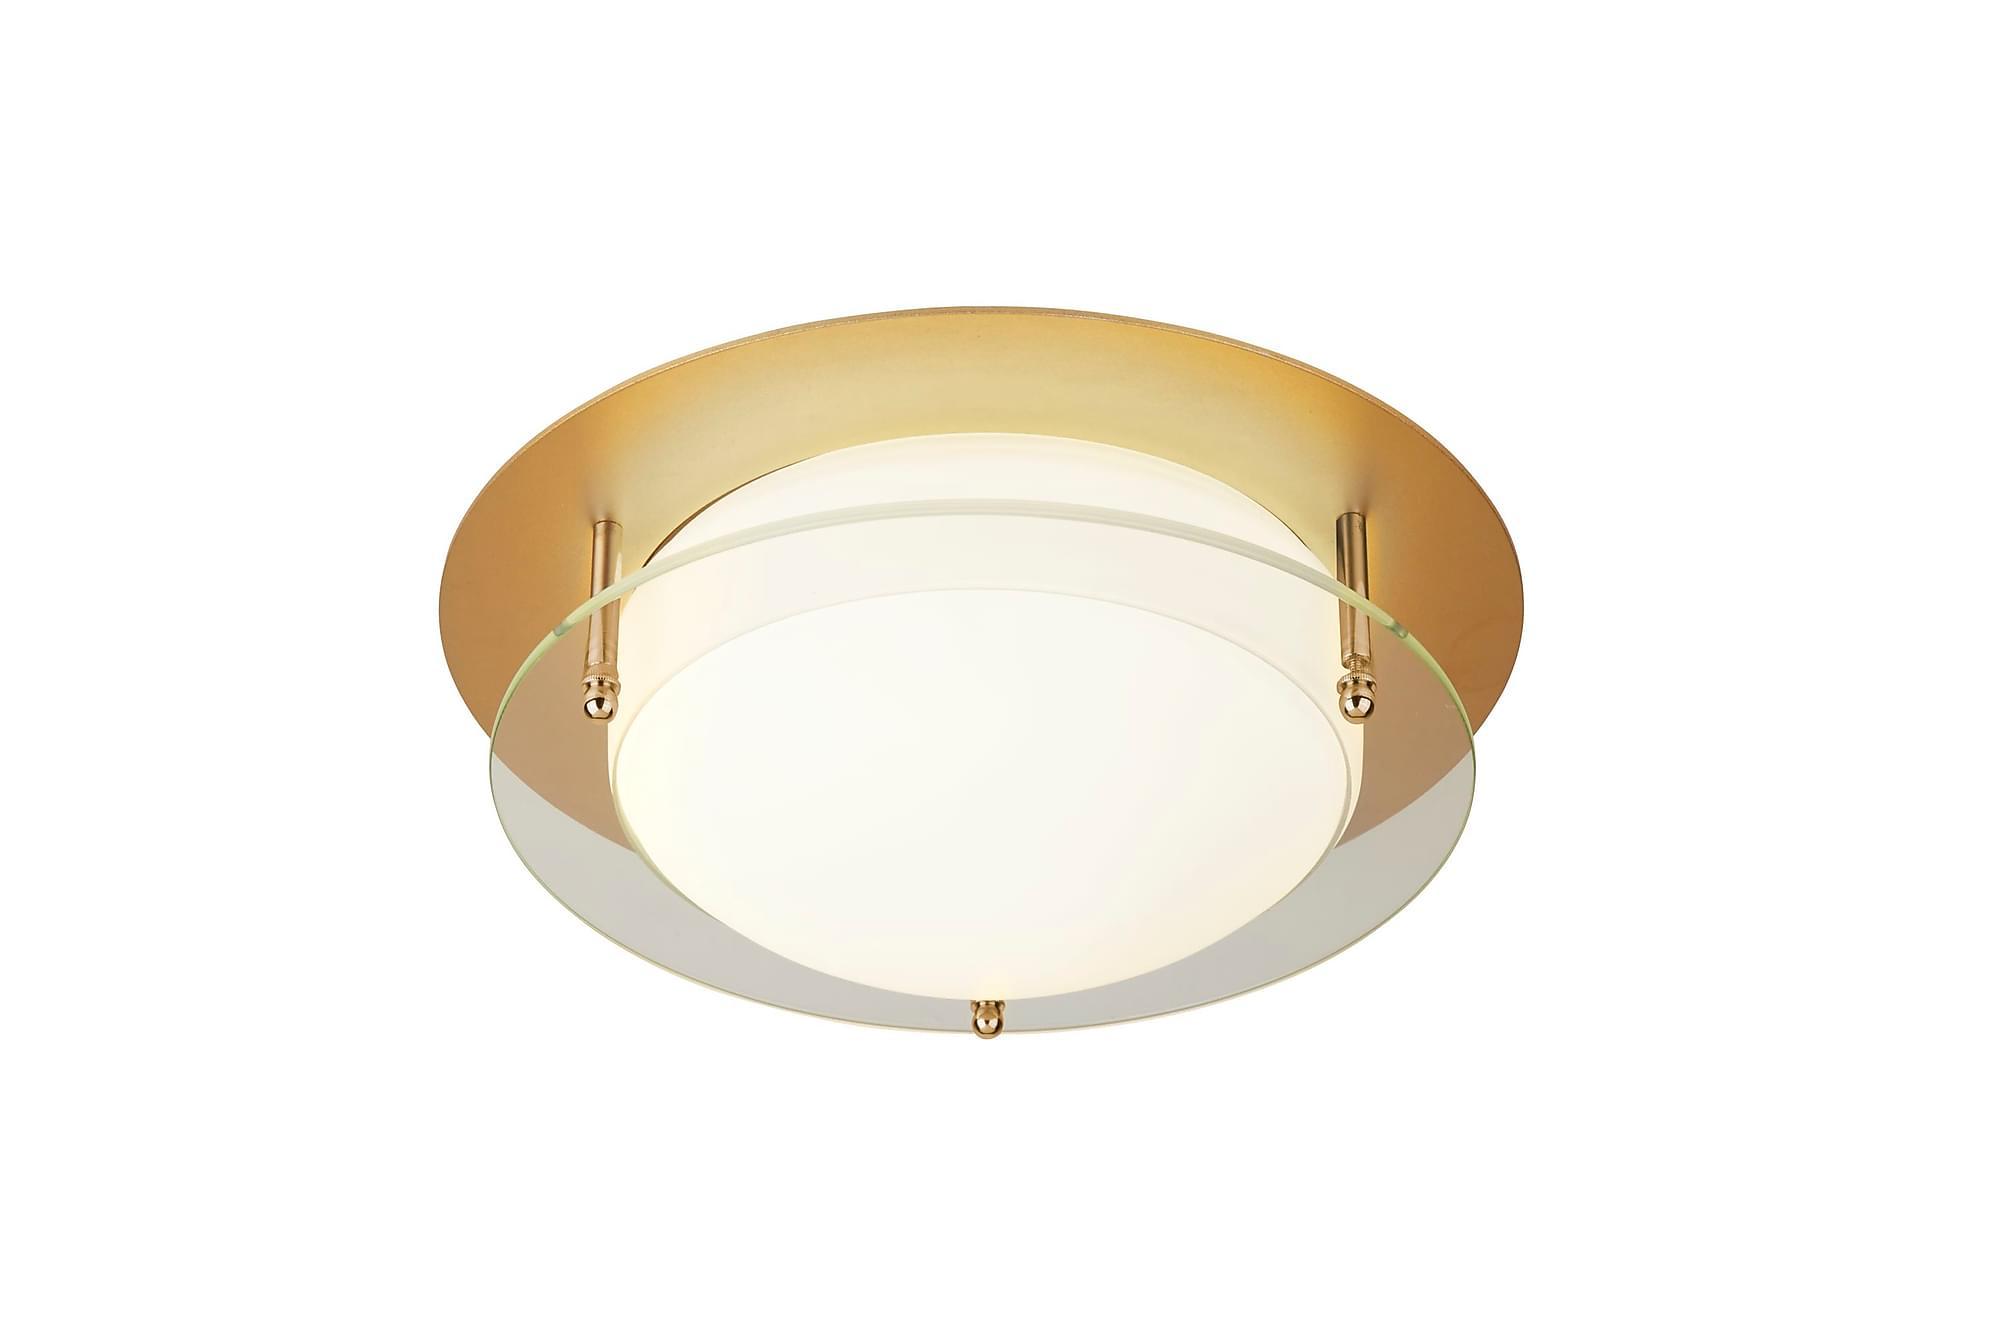 BATHROOM Flush LED Light 38 Guld/Glas, Belysning